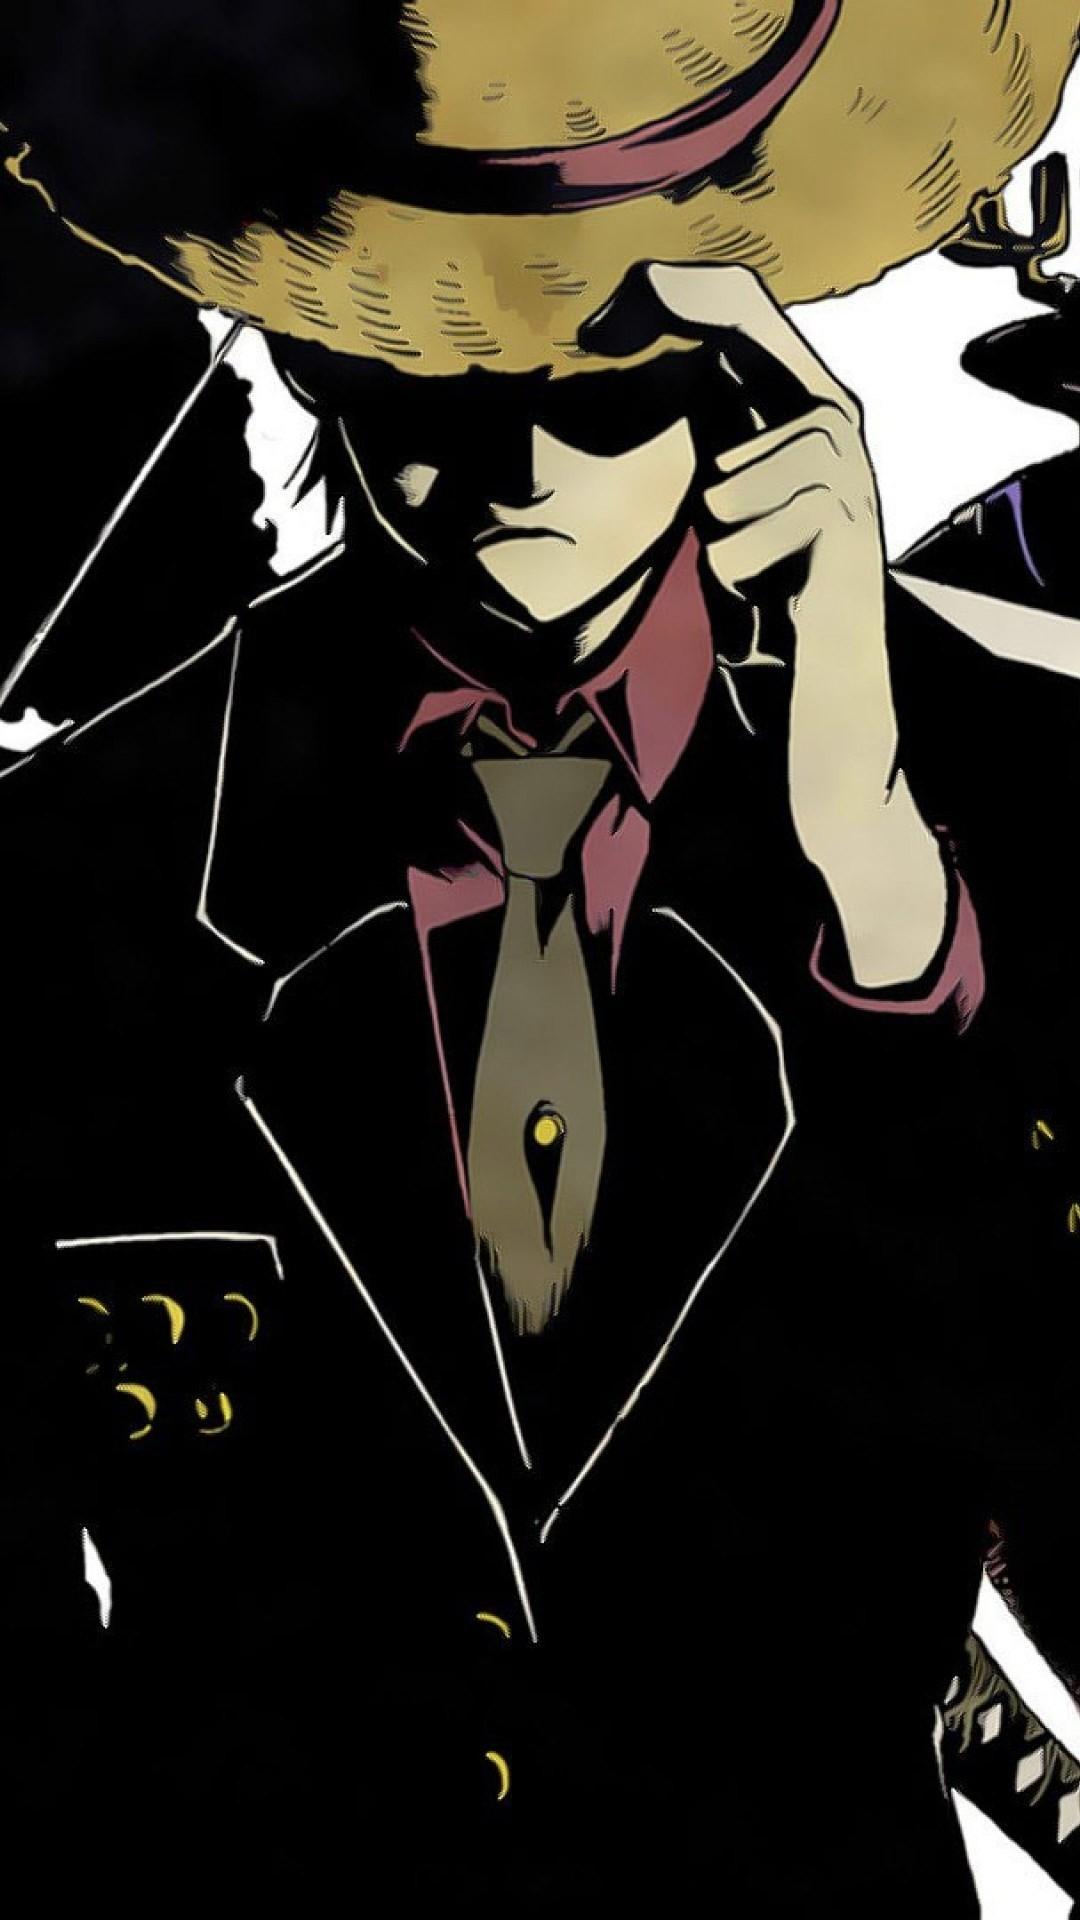 1080x1920 Anime One Piece Zoro Roronoa Wallpaper 606255